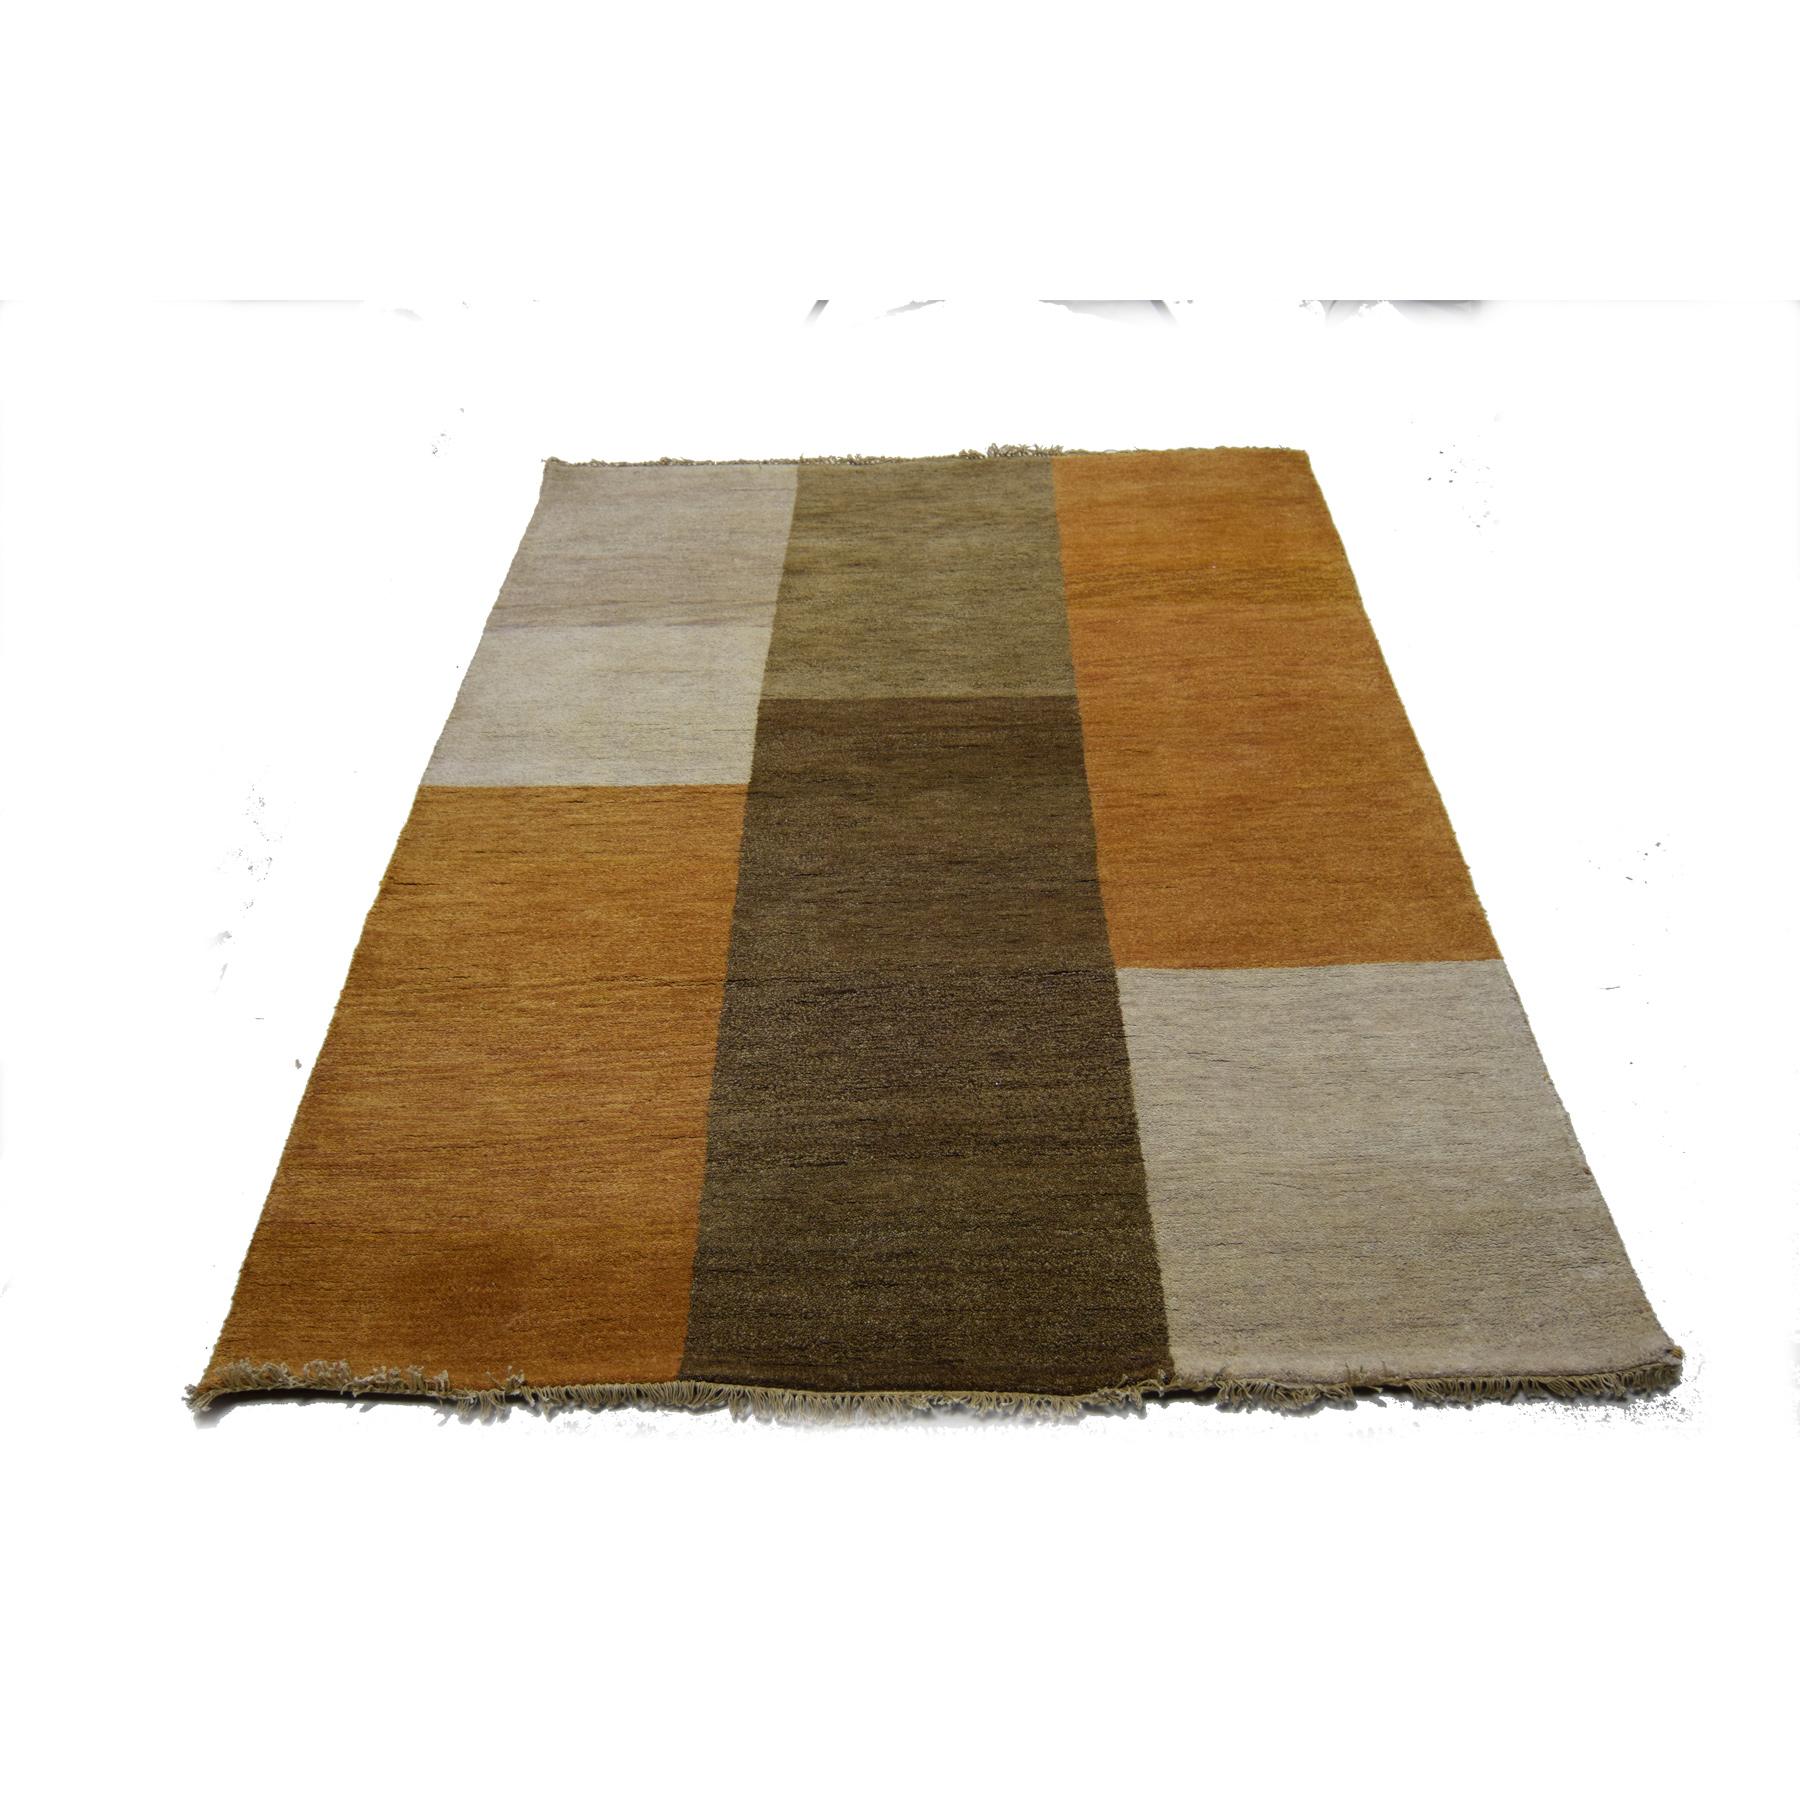 Modern Rugs Handloom Carpet 201x151cm Indian Woollen